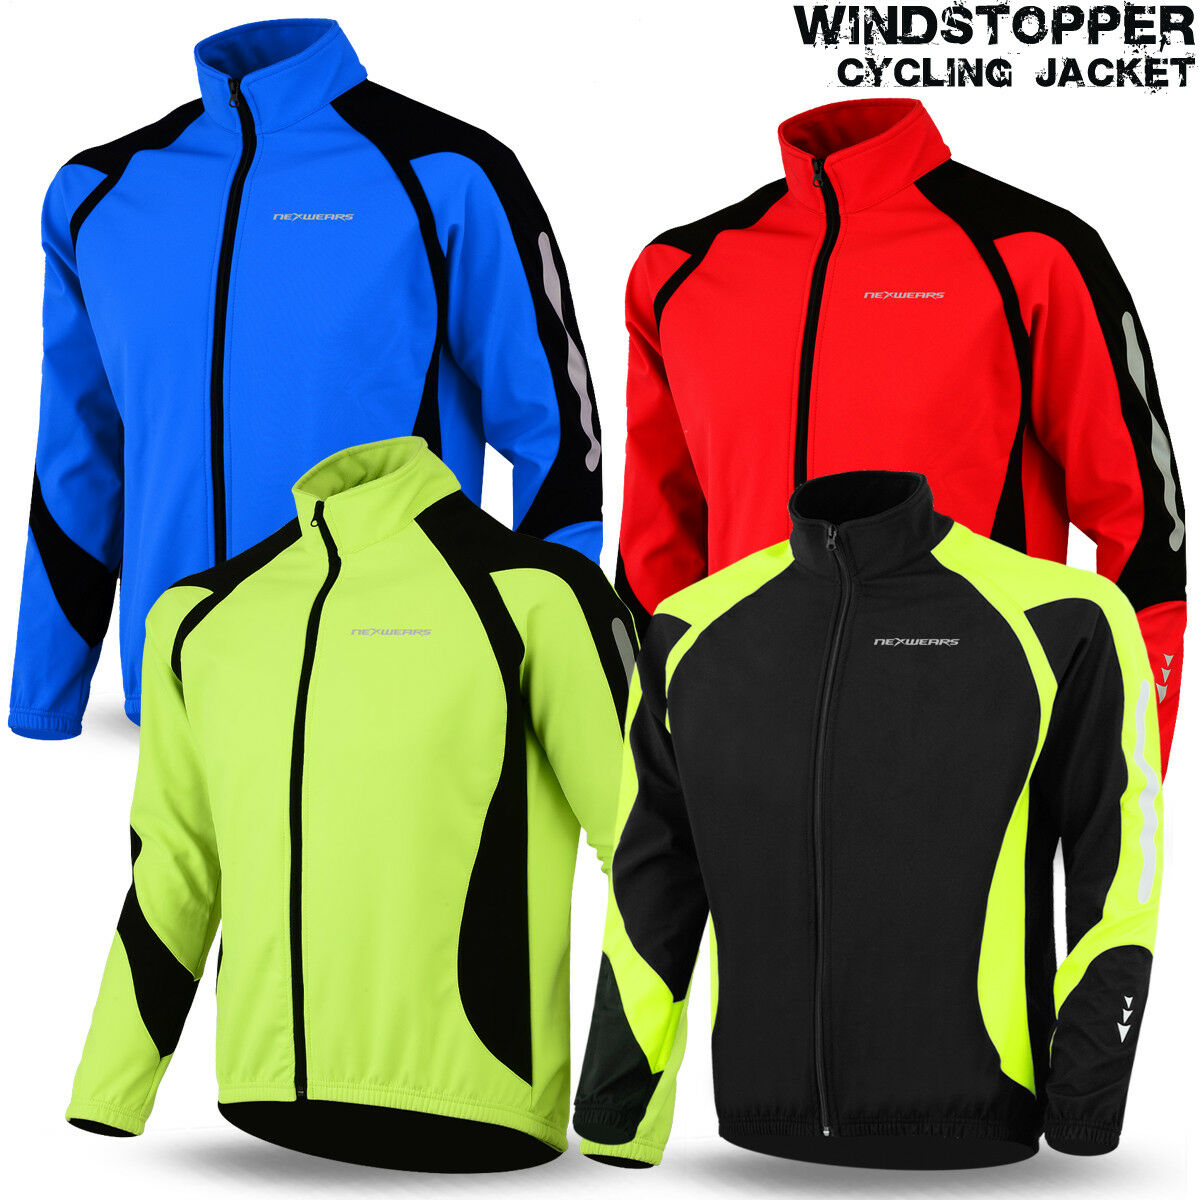 как выглядит Велокуртка Cycling Jacket Windstopper Winter Thermal Fleece Windproof Long Sleeve Bike Coat фото